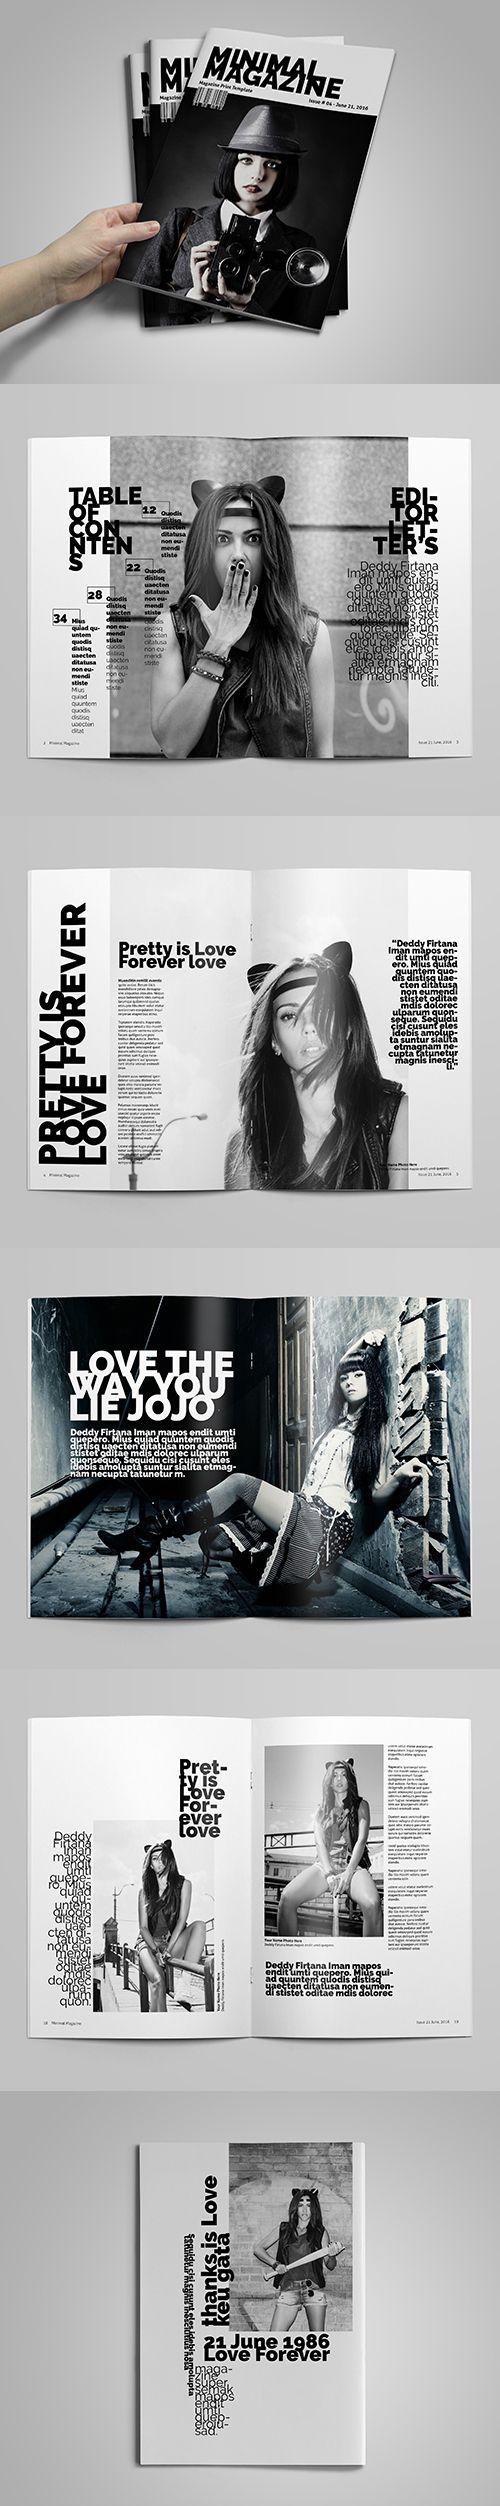 Minimal A4 Magazine/Catalog Template